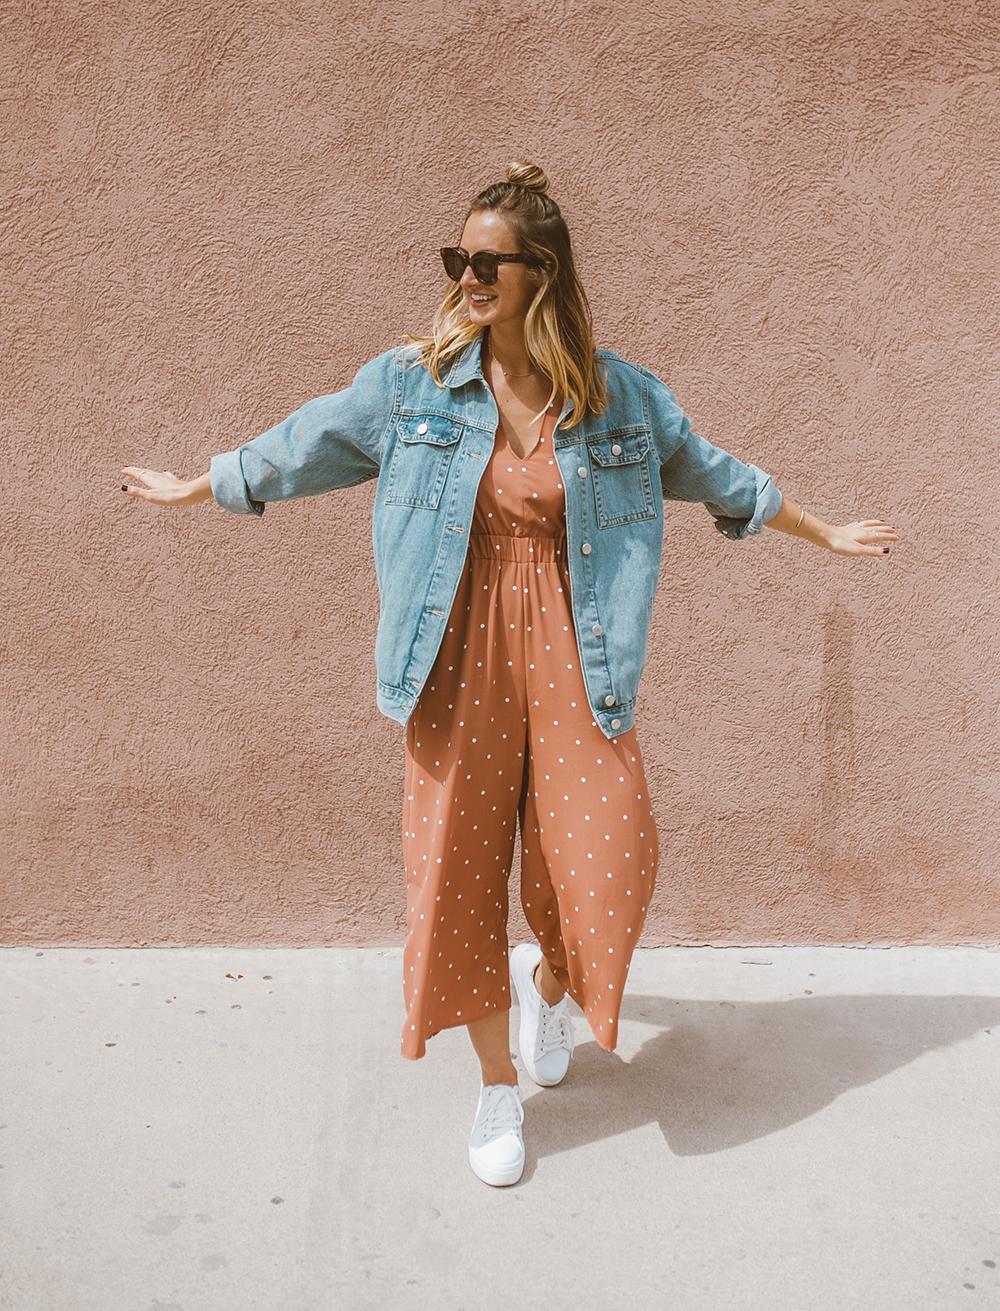 livvyland-blog-olivia-watson-asos-el-paso-hotel-indigo-what-to-wear-pink-jumpsuit-7